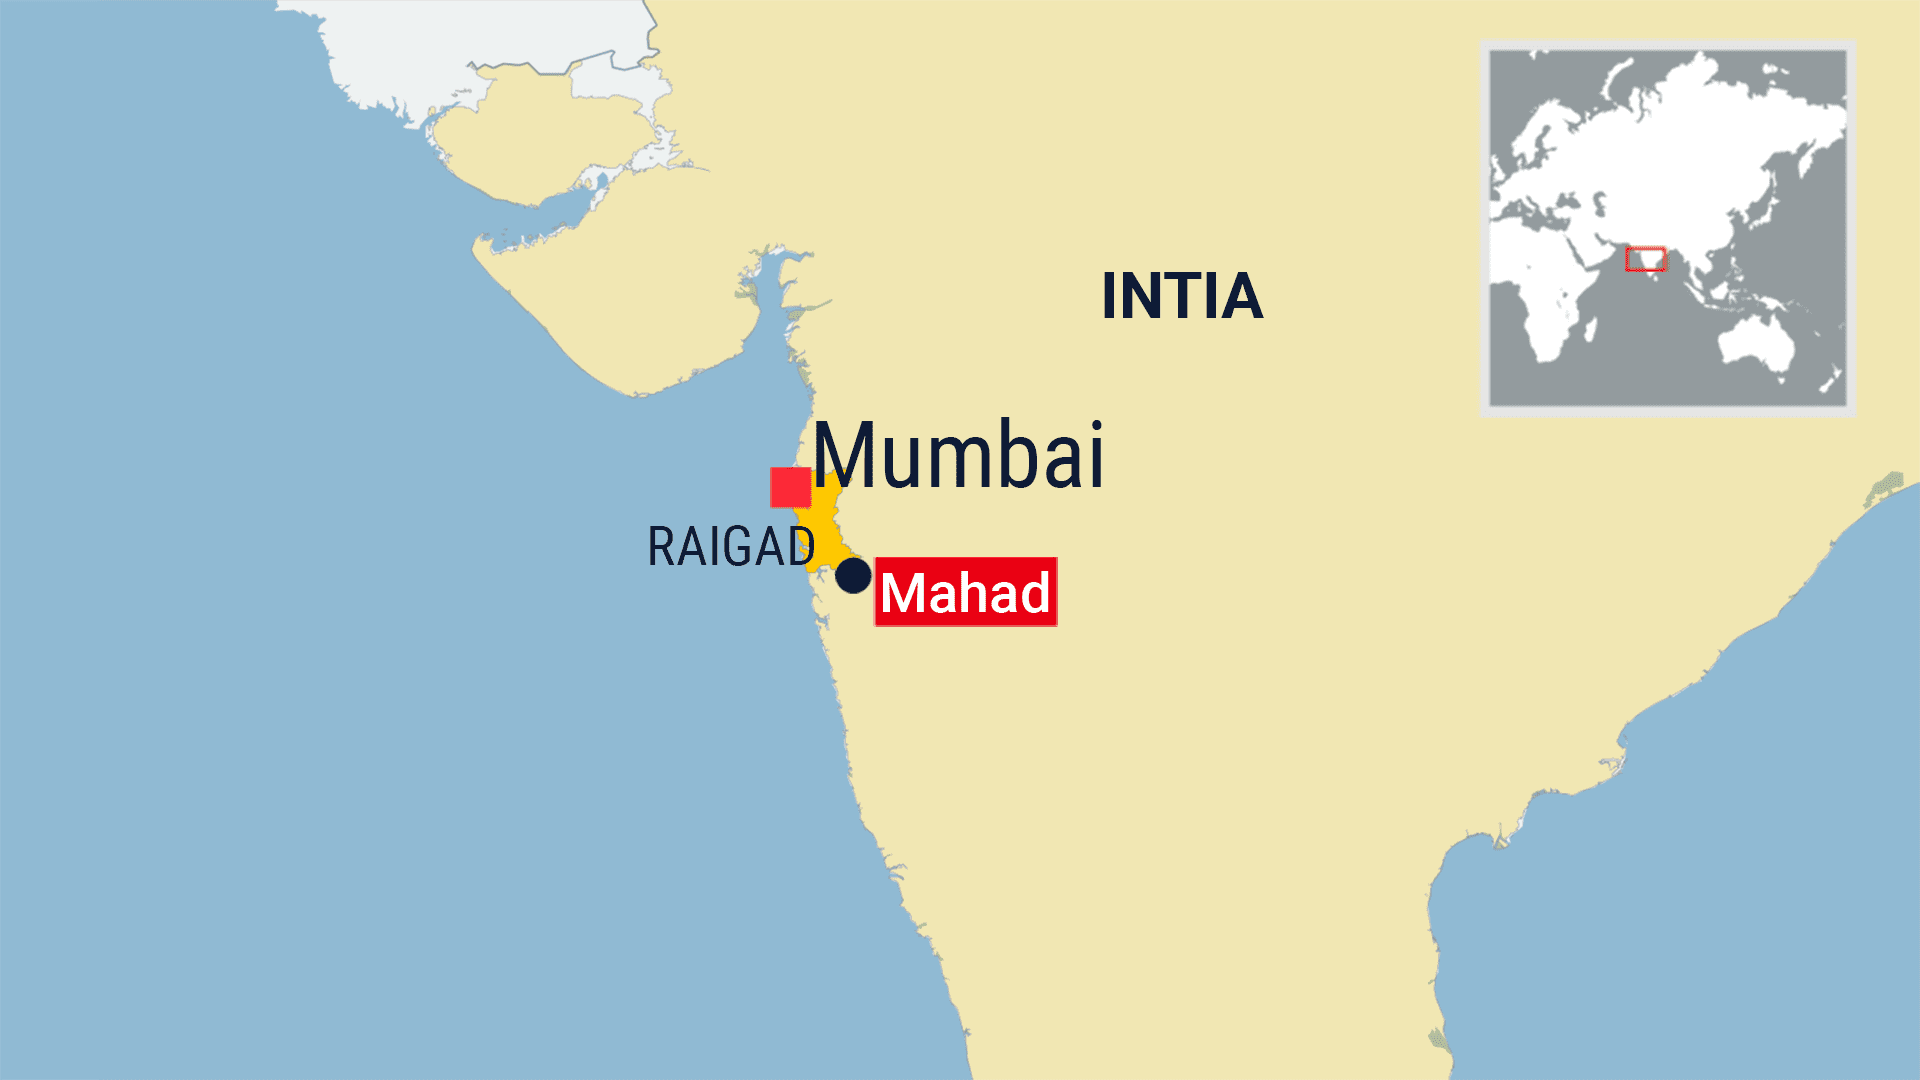 Kartta Intia, Mumbai, Mahad-kaupunki